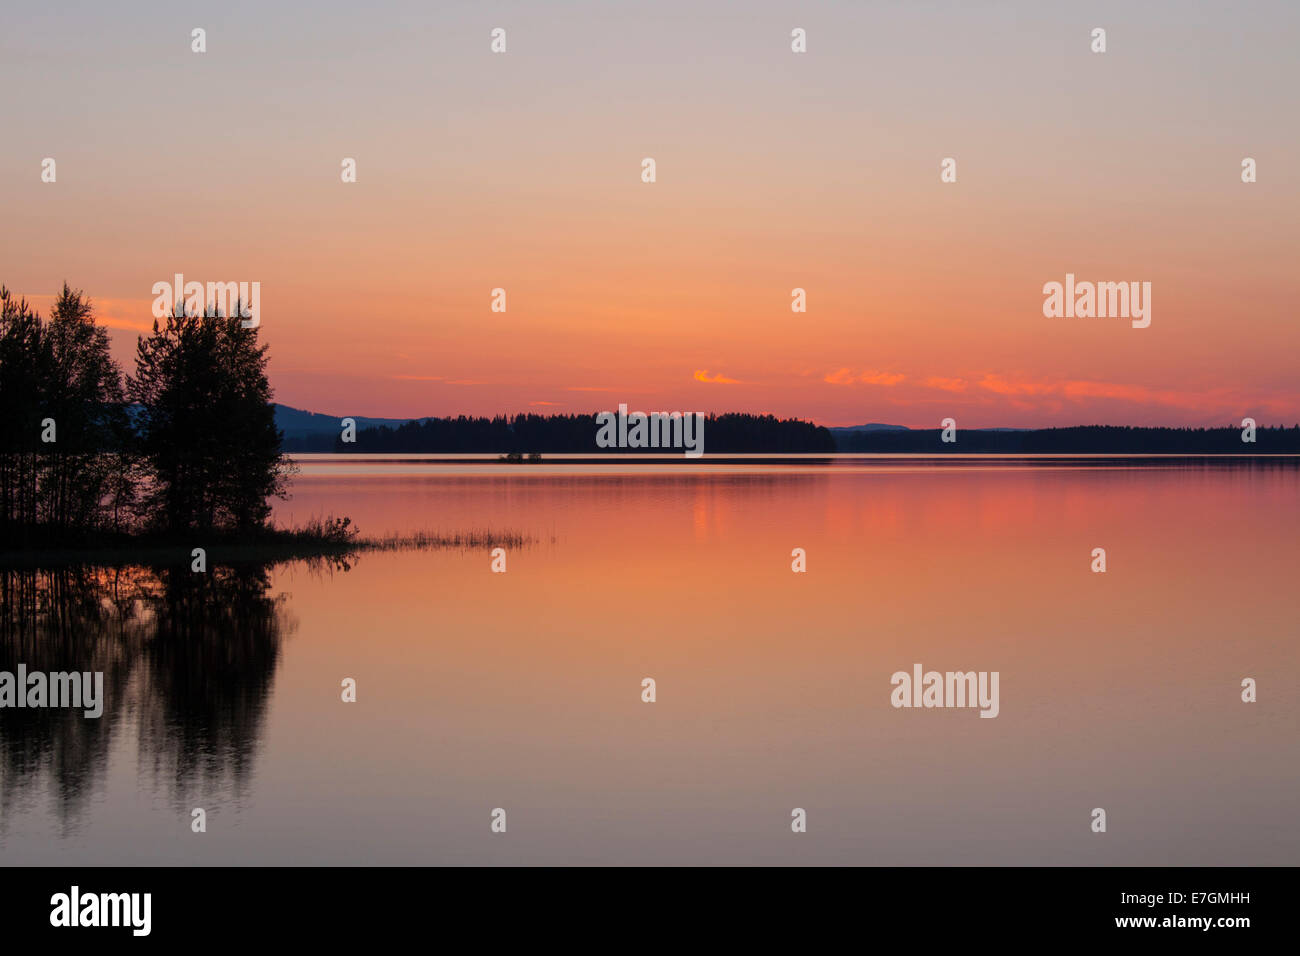 Silhouetted trees along Lake Siljan in summer at sunset, Dalarna, Sweden Stock Photo